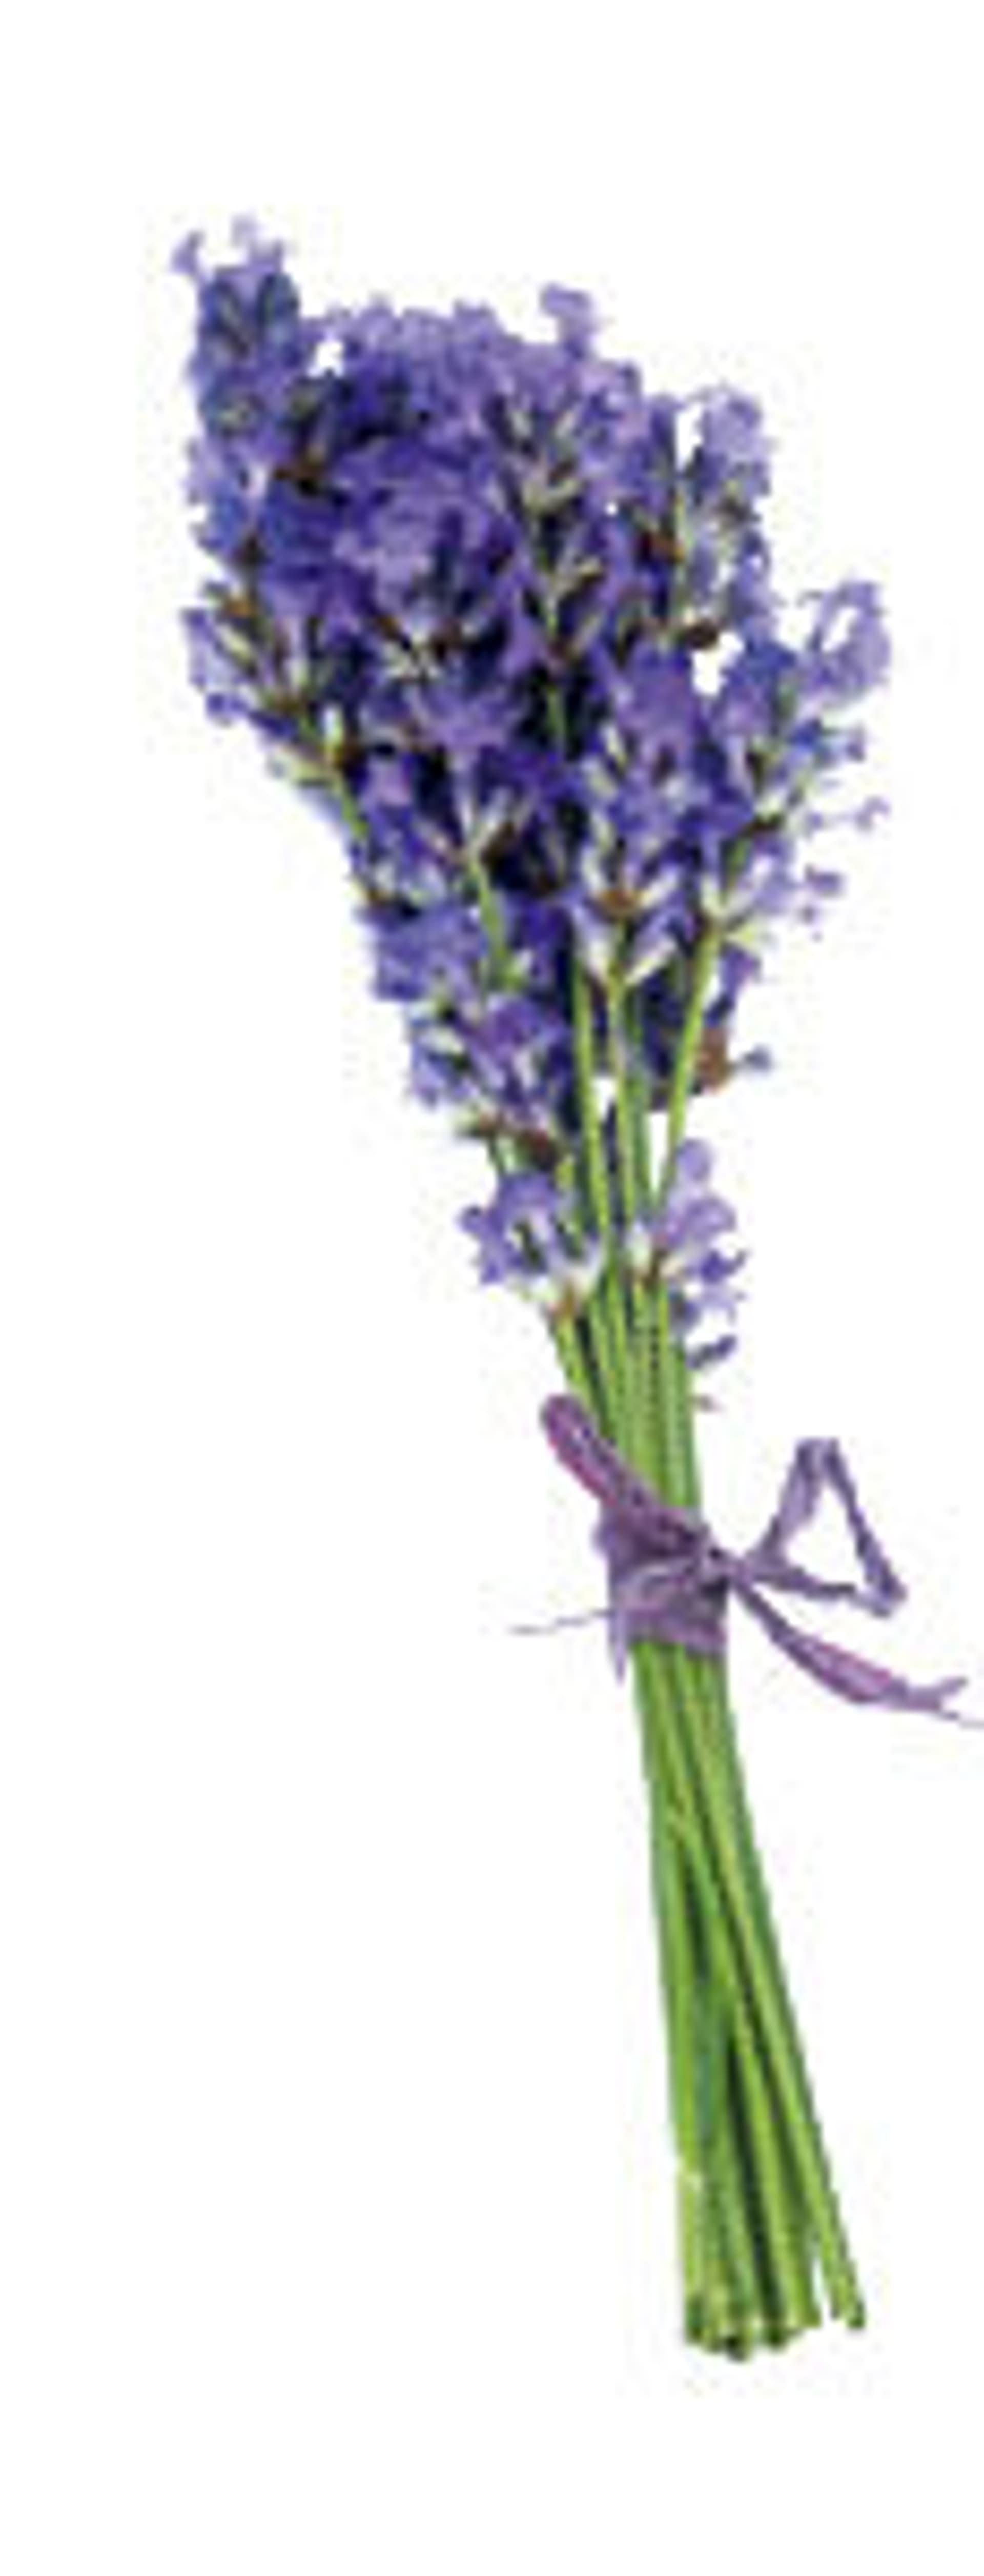 Lavendel (Foto: gettyimages/Rosemary Calvert)